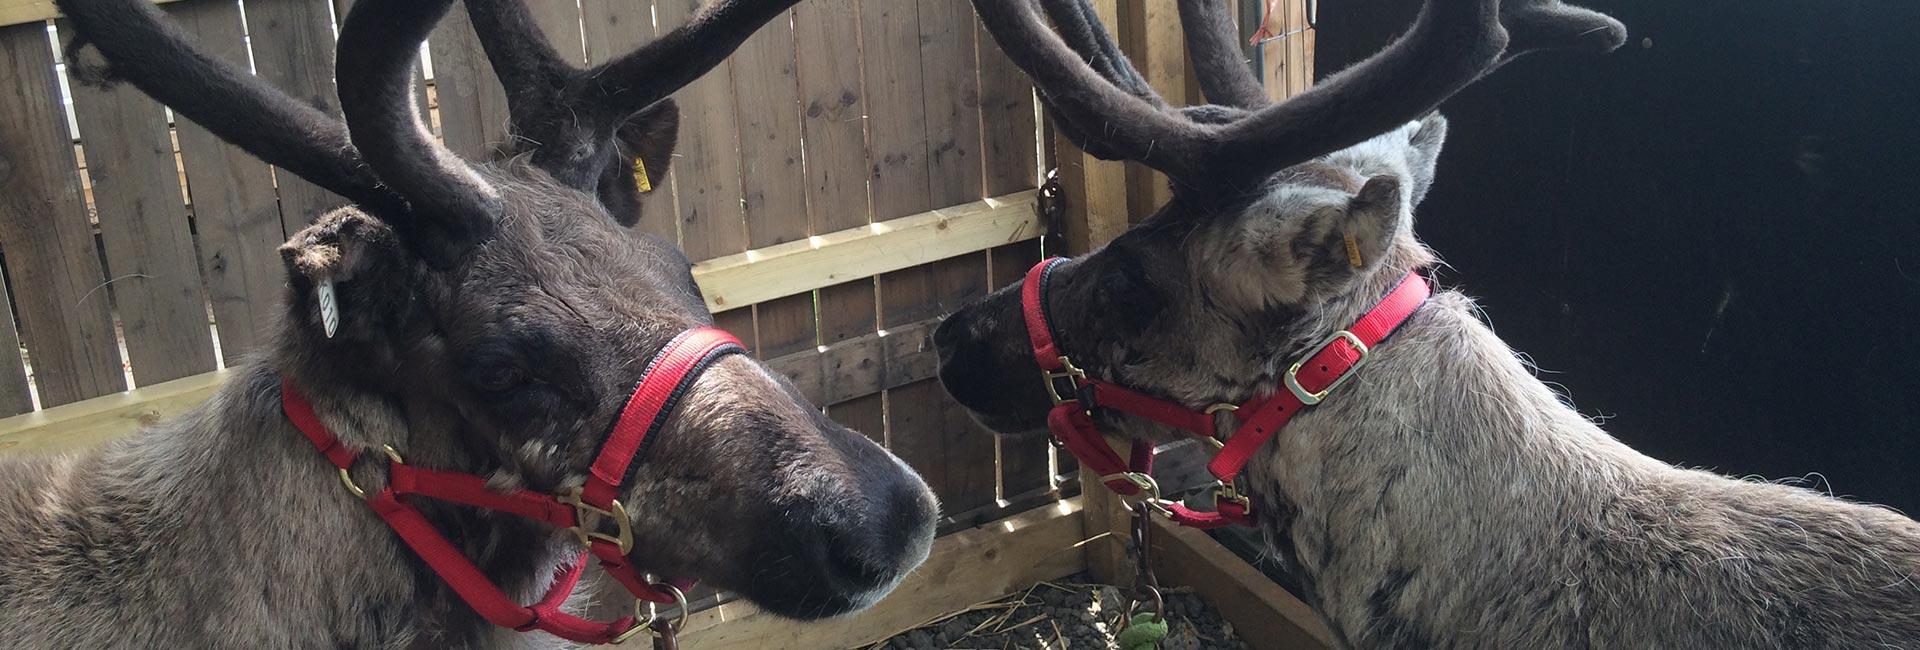 reindeers with head collars